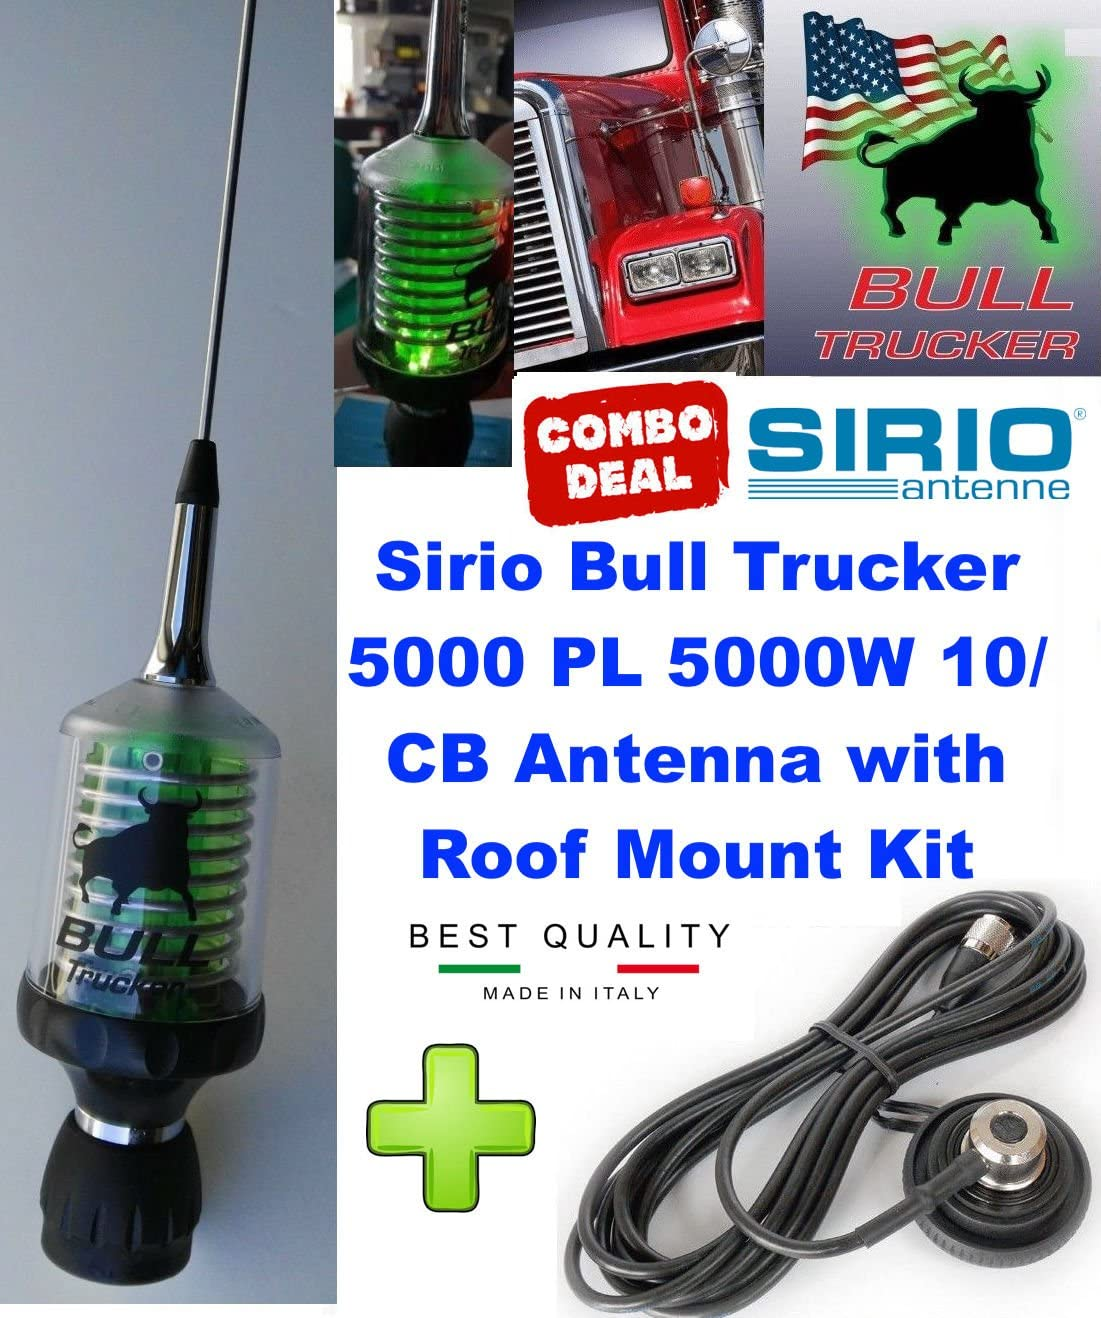 Amazon.com: Sirio Bull Trucker 5000 PL 5000W CB & 10M Green LED Mobile  Antenna Roof Mount Kit: Home Audio & Theater